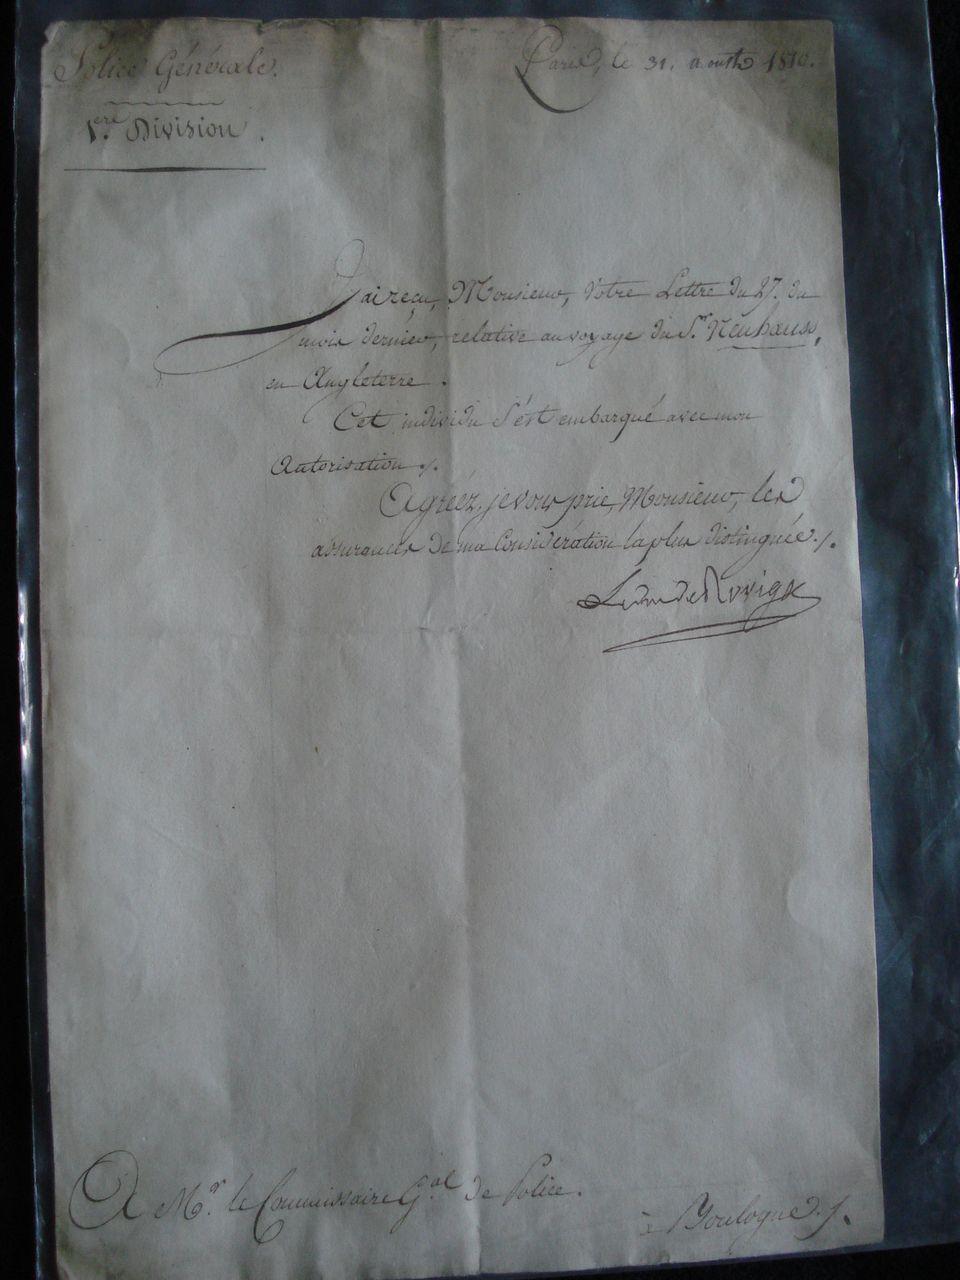 Original letter from Duc de Rovigo General of Napoleon Bonaparte.